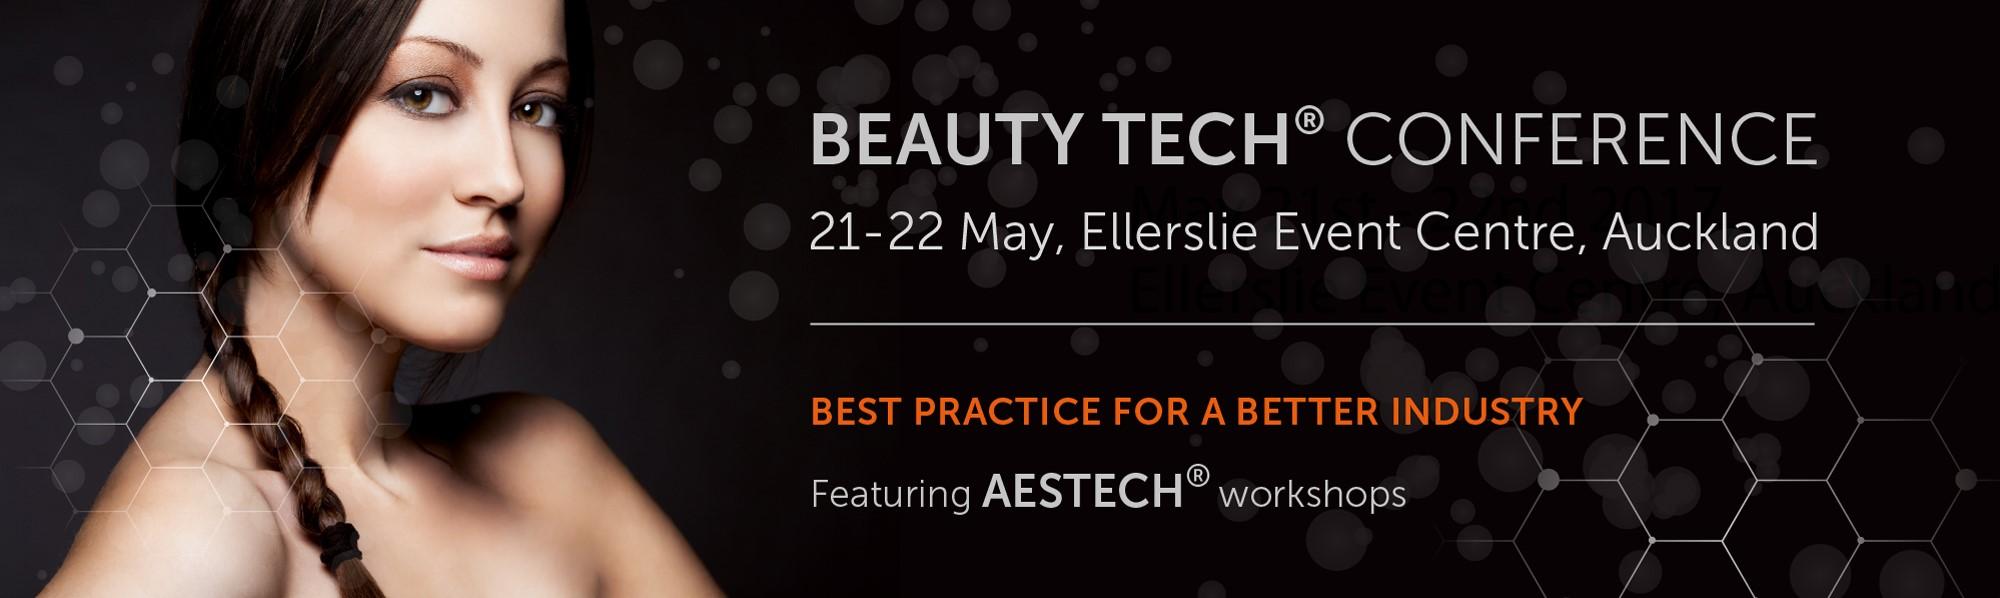 Beauty Tech Conference